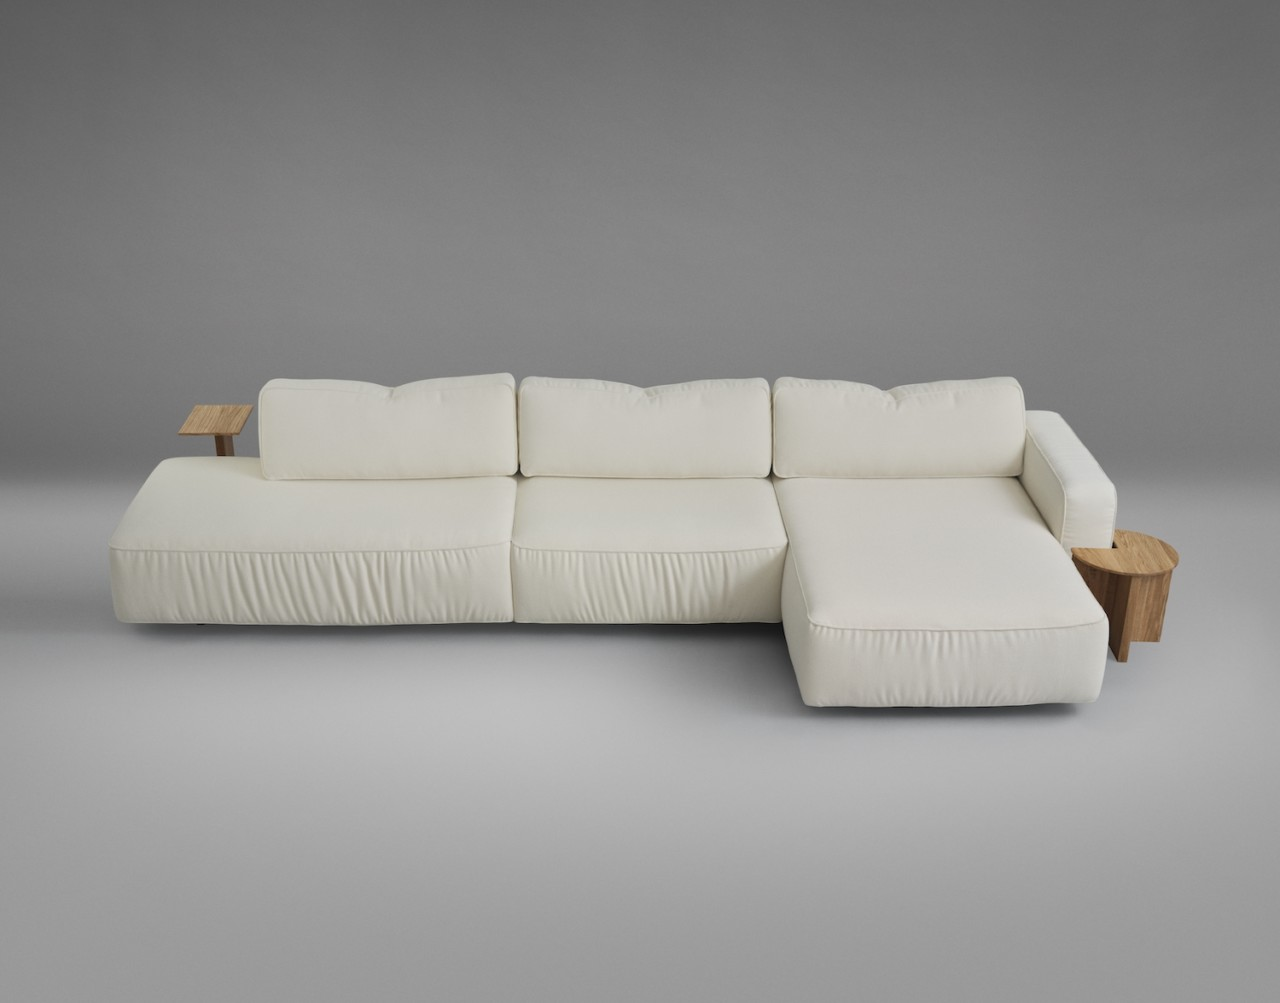 Supersoft Modular Sofa by Note Design Studio